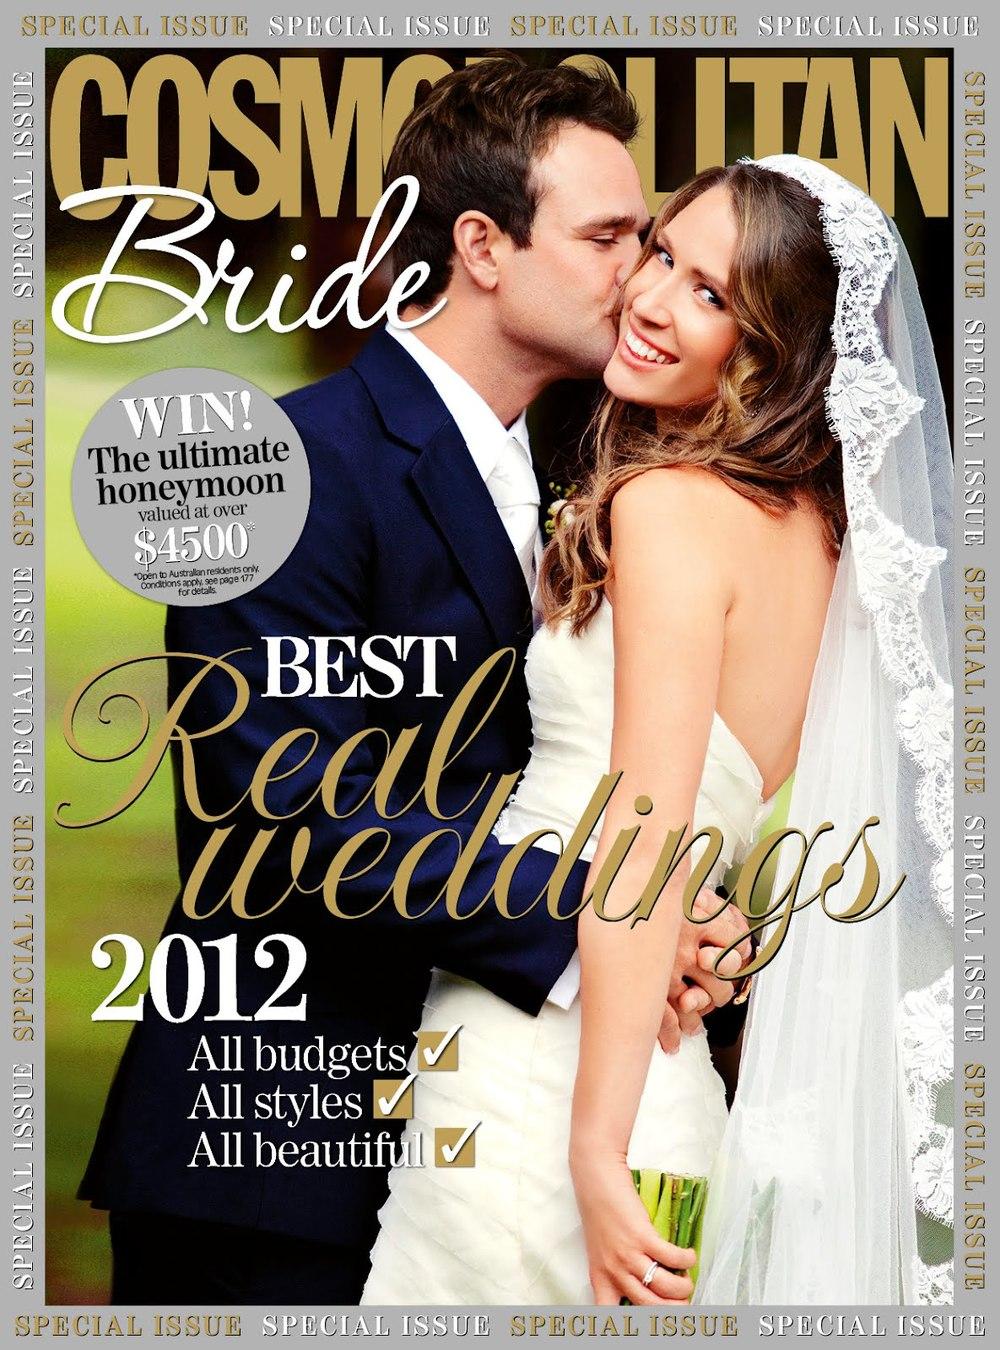 Real Weddings 2012